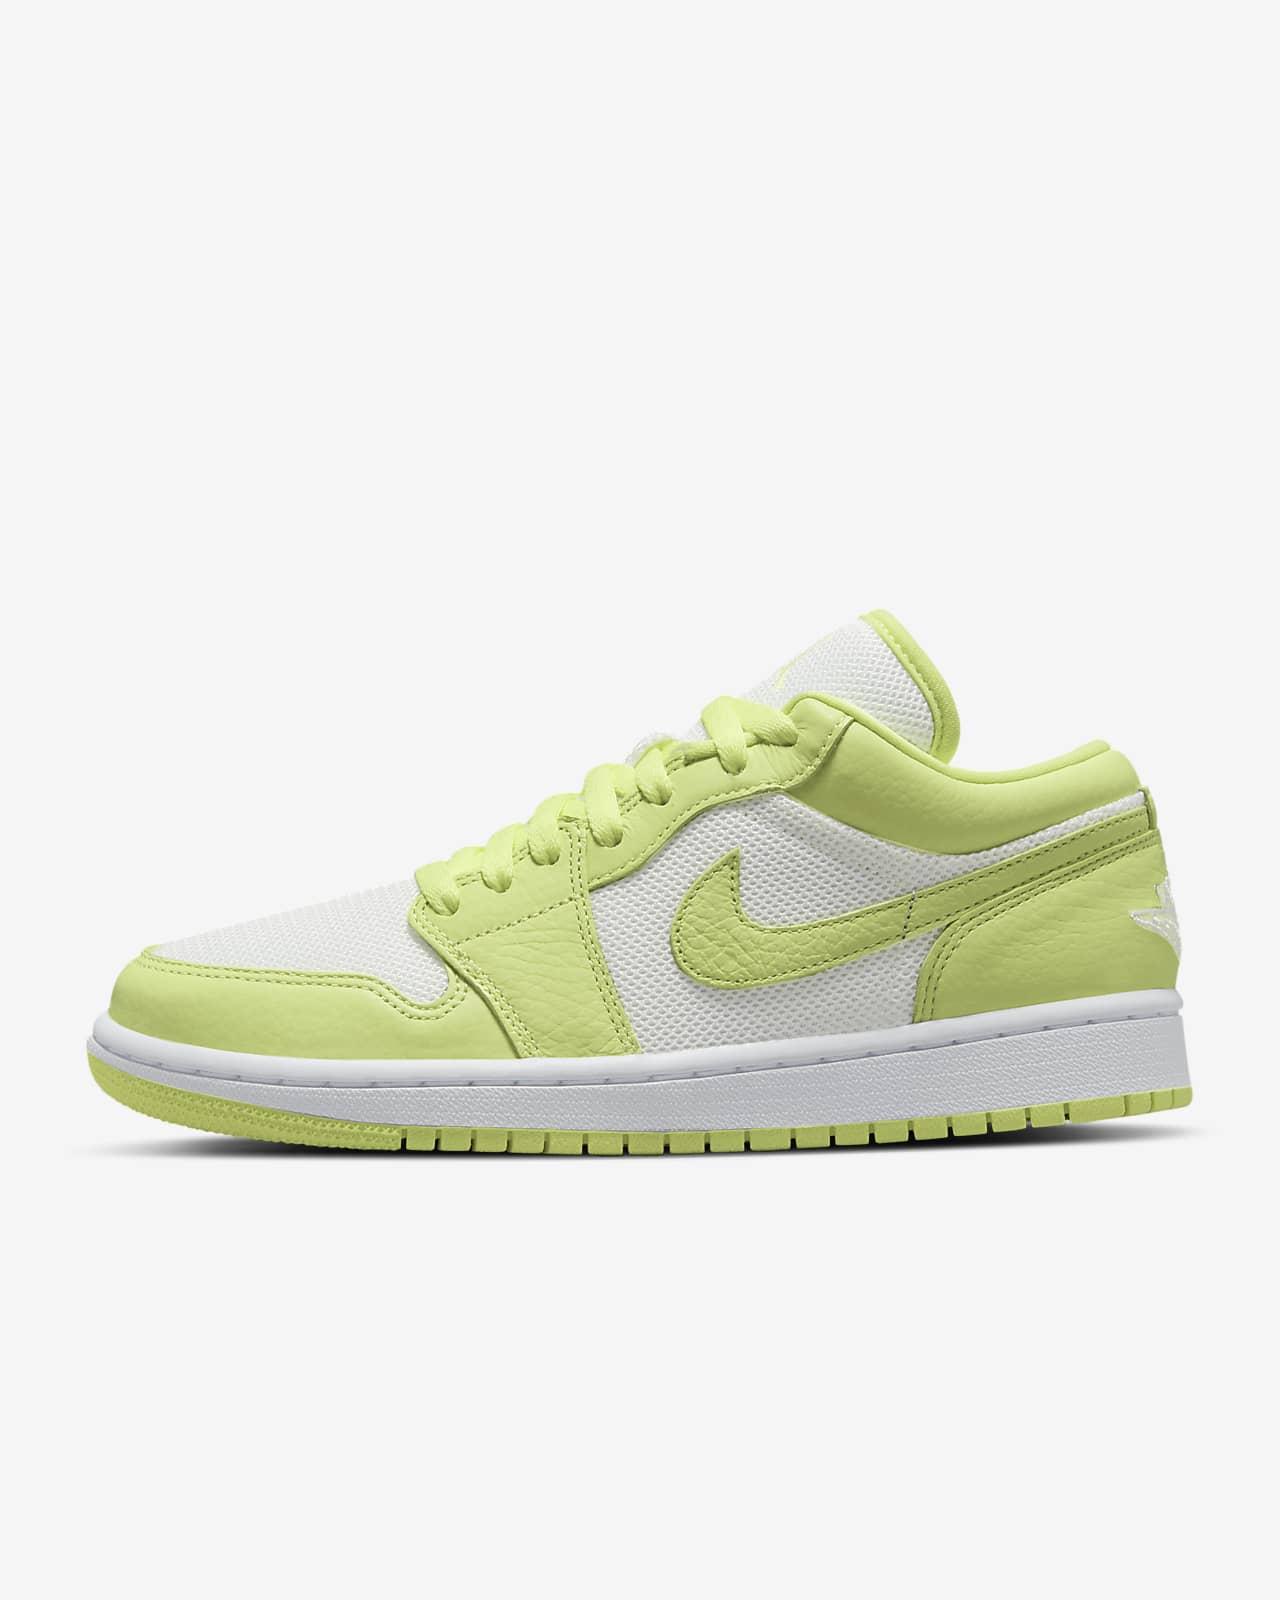 Air Jordan 1 Low SE Women's Shoe